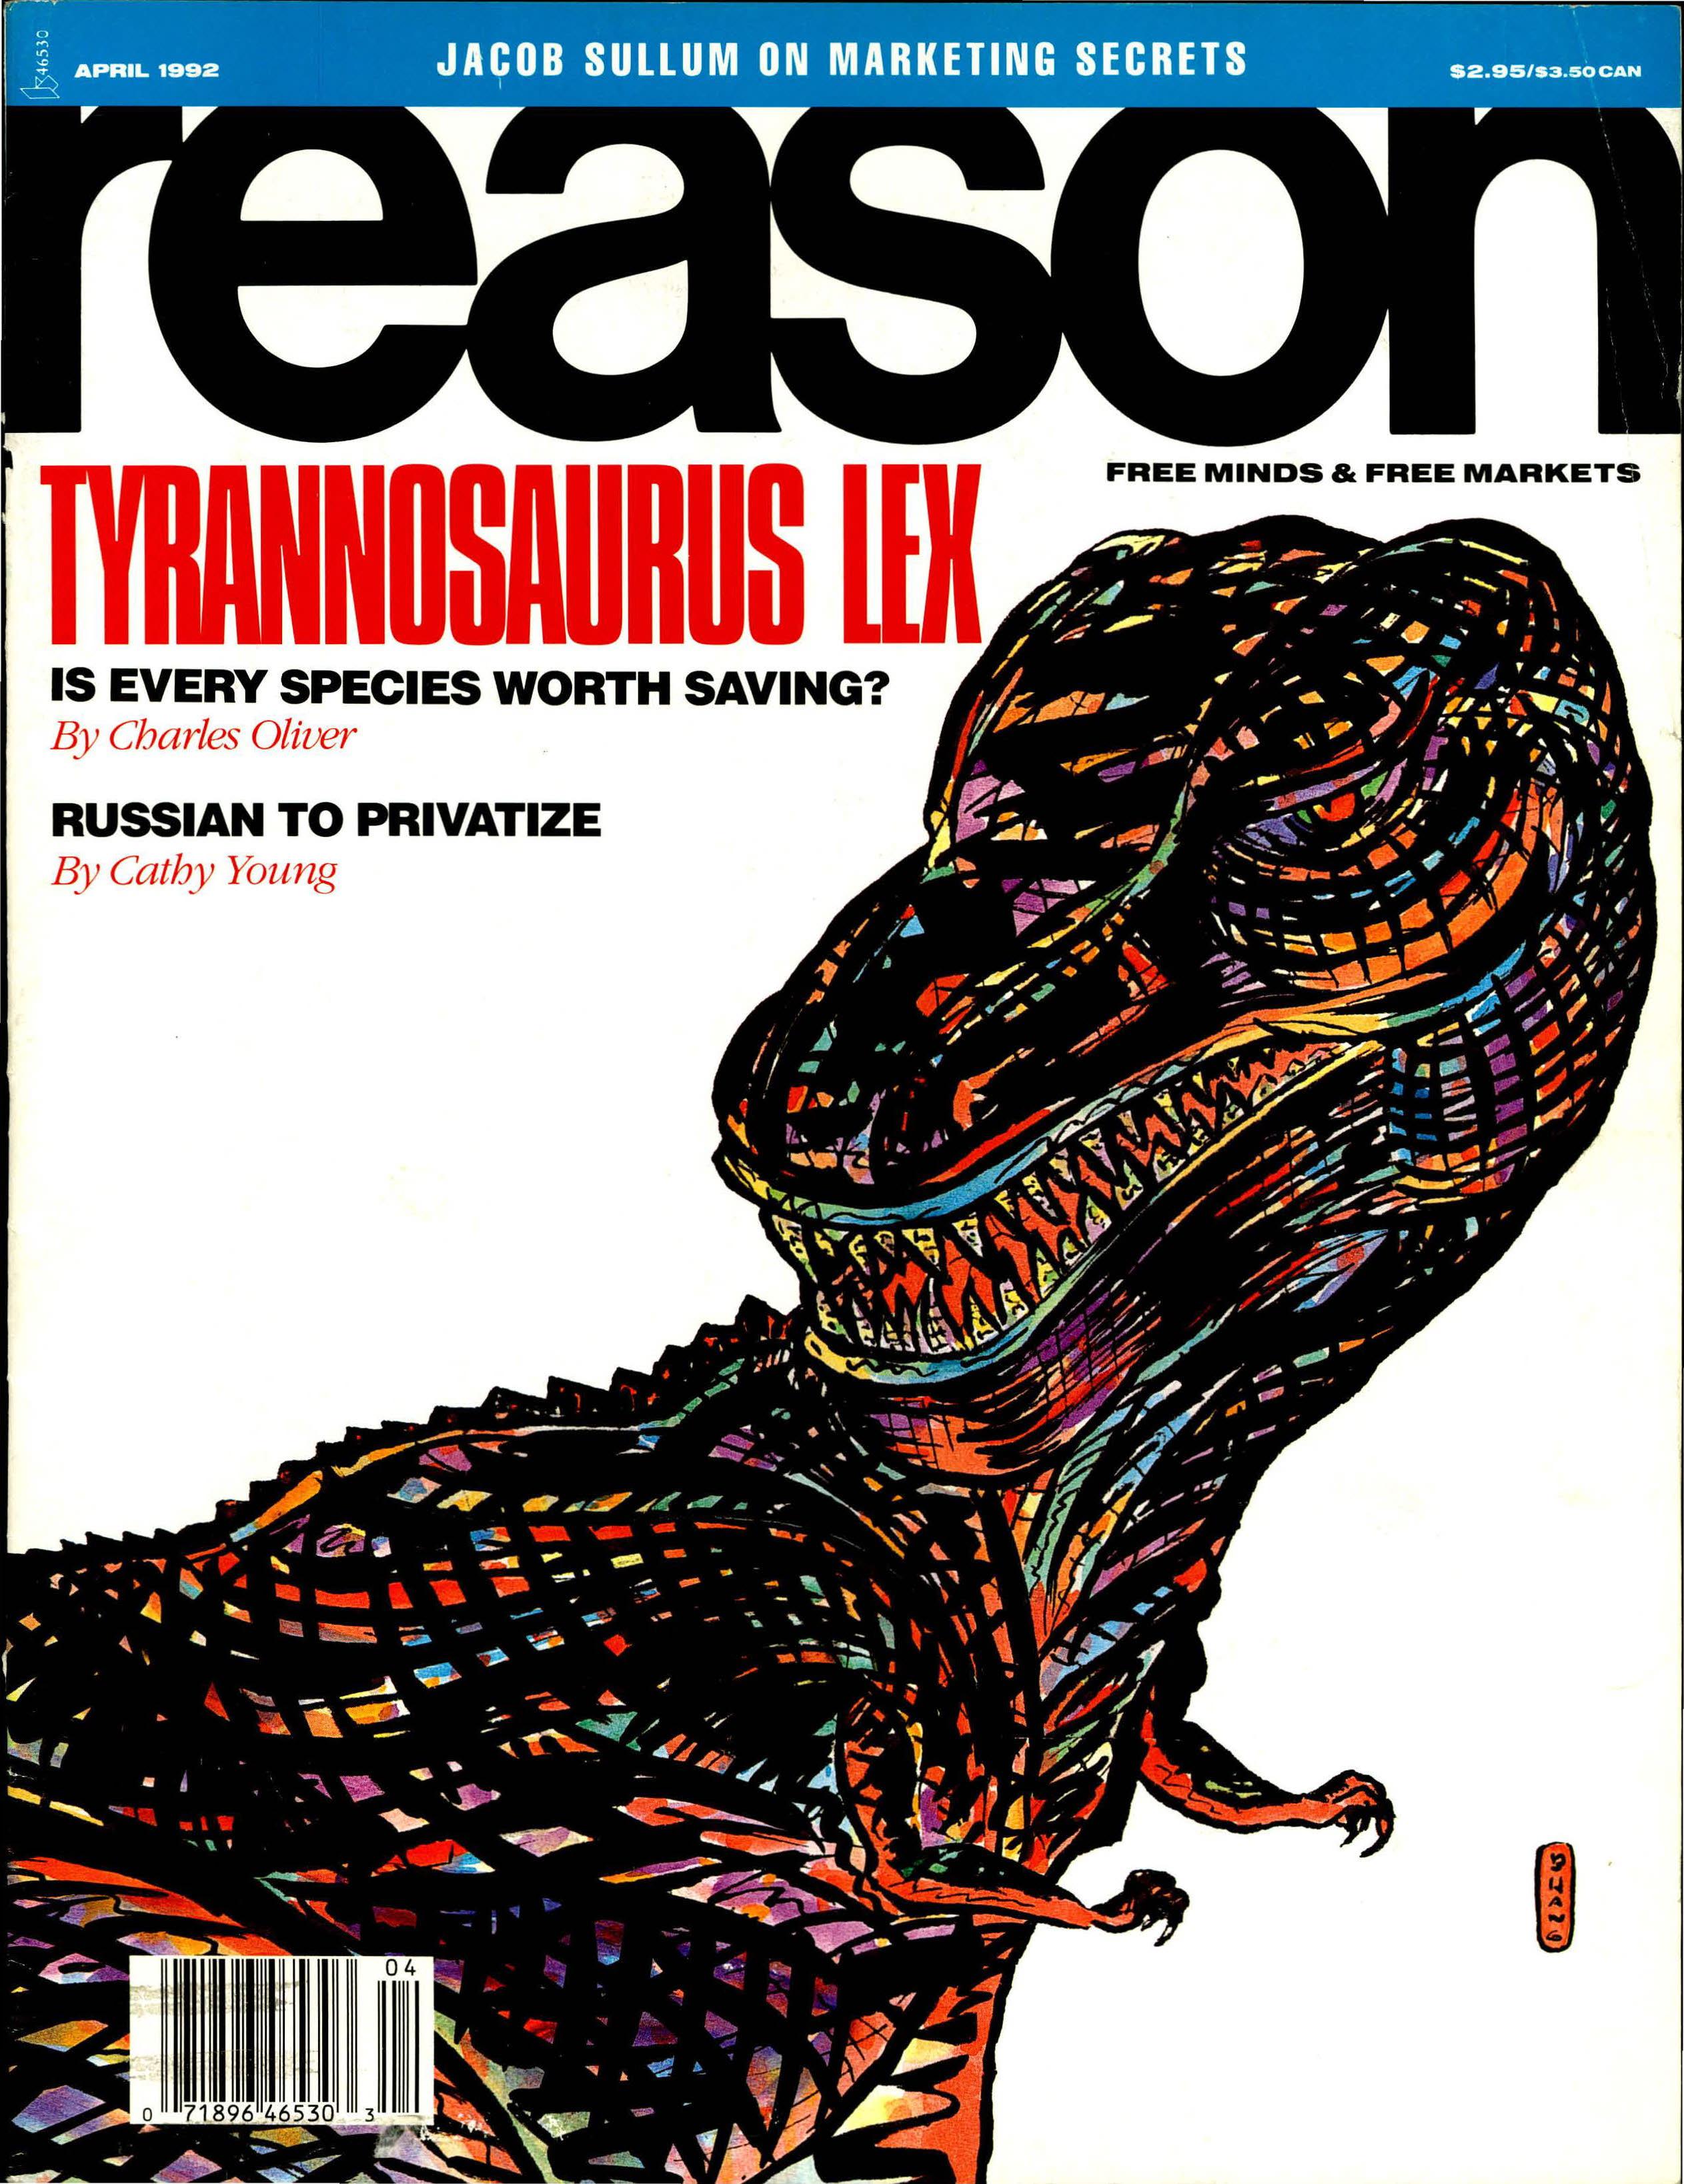 Reason Magazine, April 1992 cover image